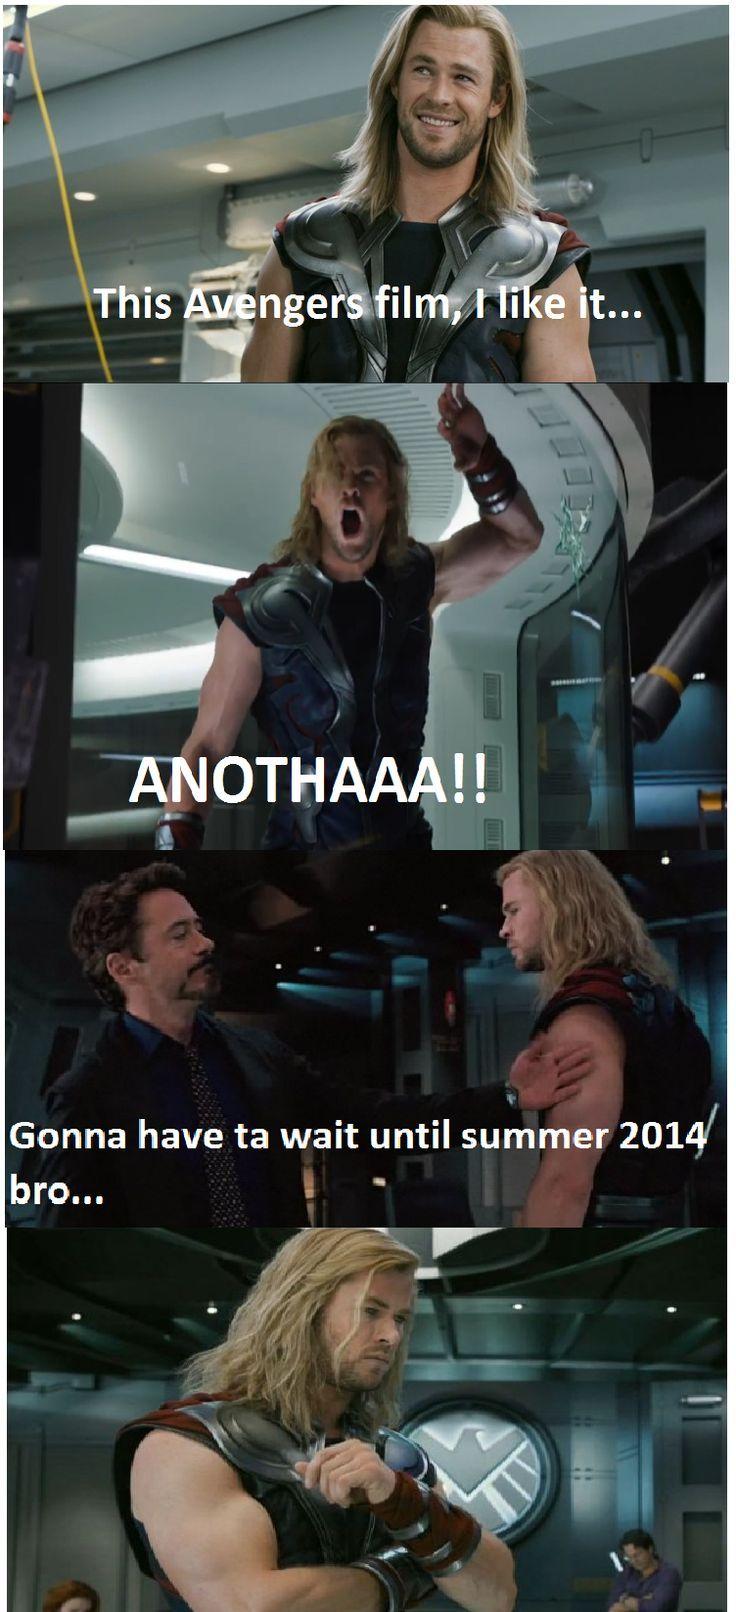 fe9059eda068a32aab08973bb699c394 avengers memes, thor putting hammer down google search,Avengers Meme